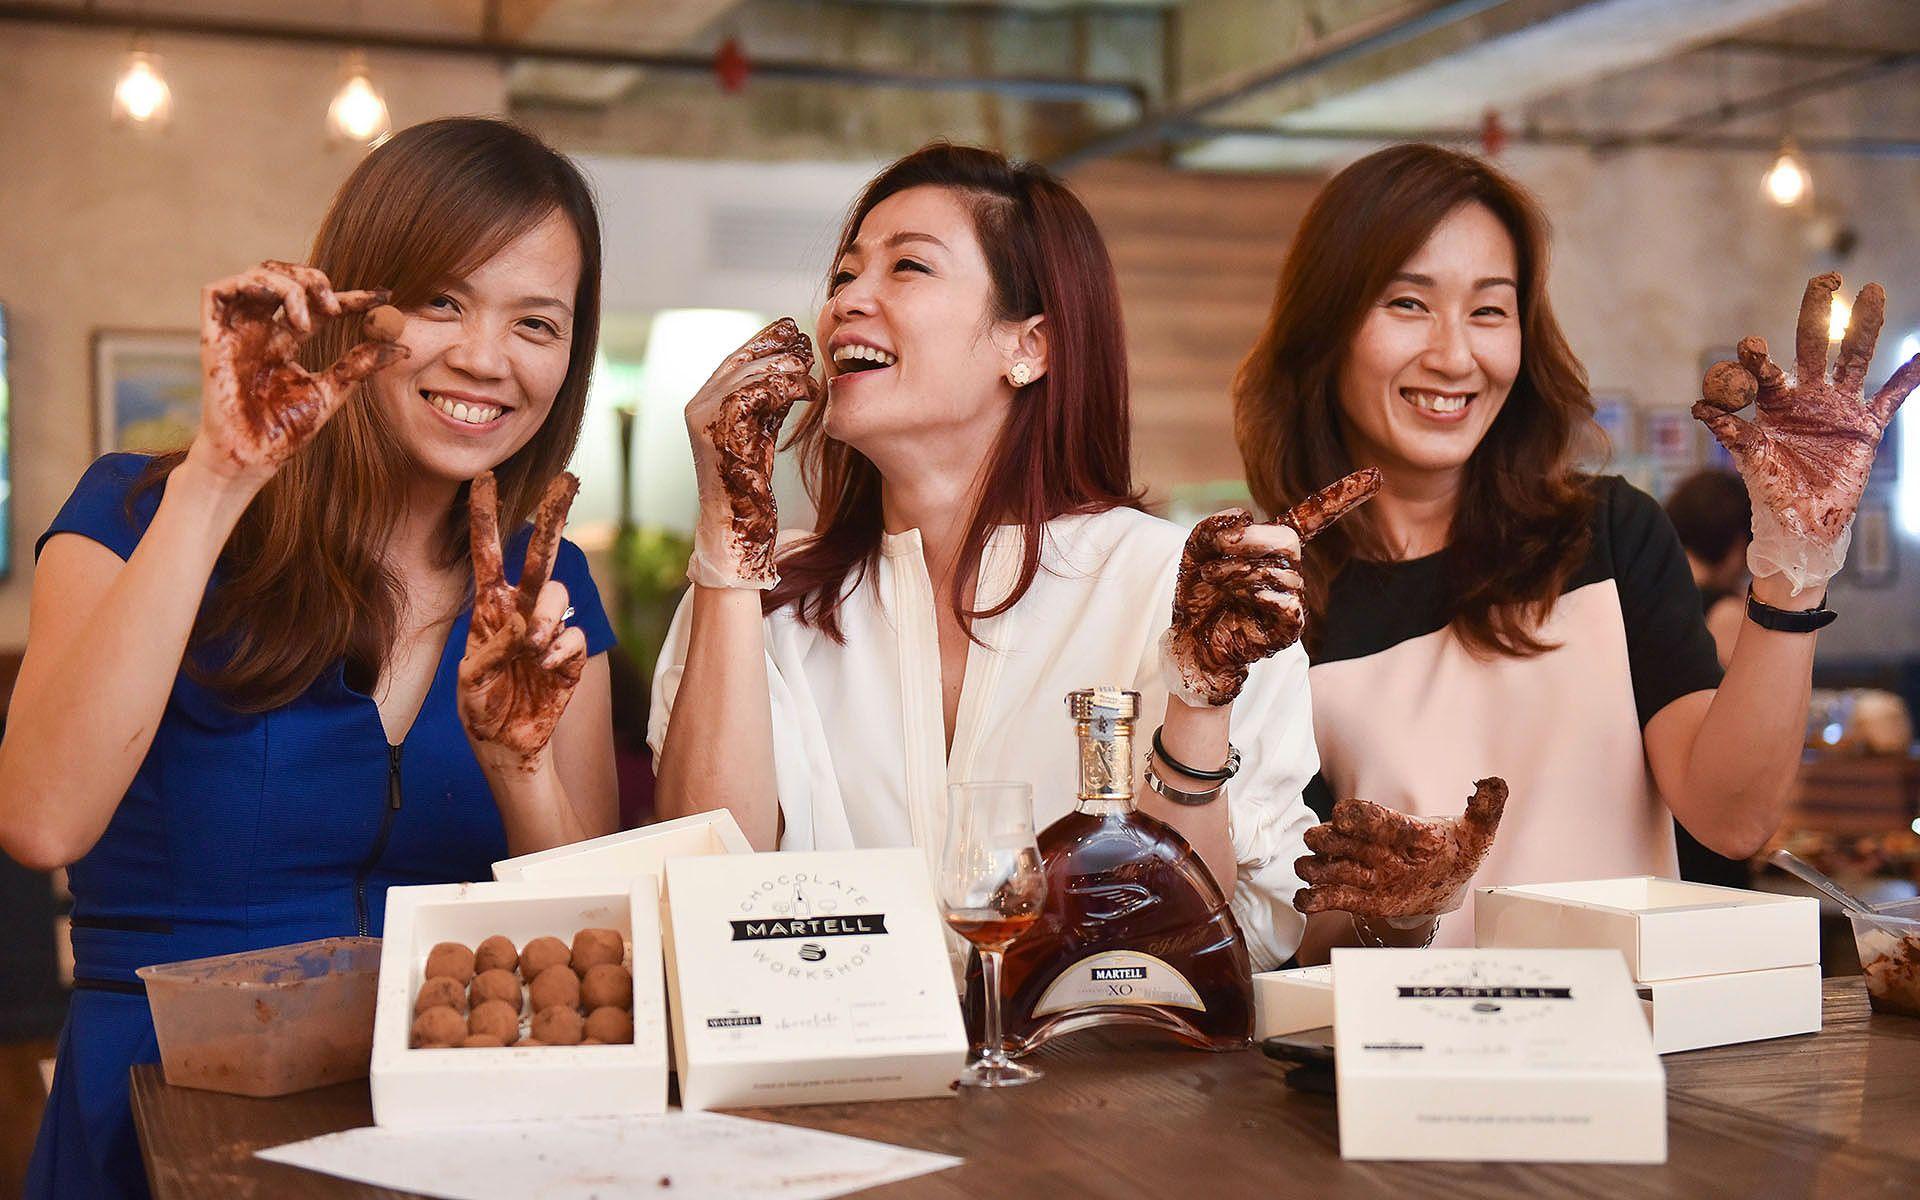 Sneak Peek: Experience A Cognac & Chocolate Workshop With Martell & Chocolate Concierge